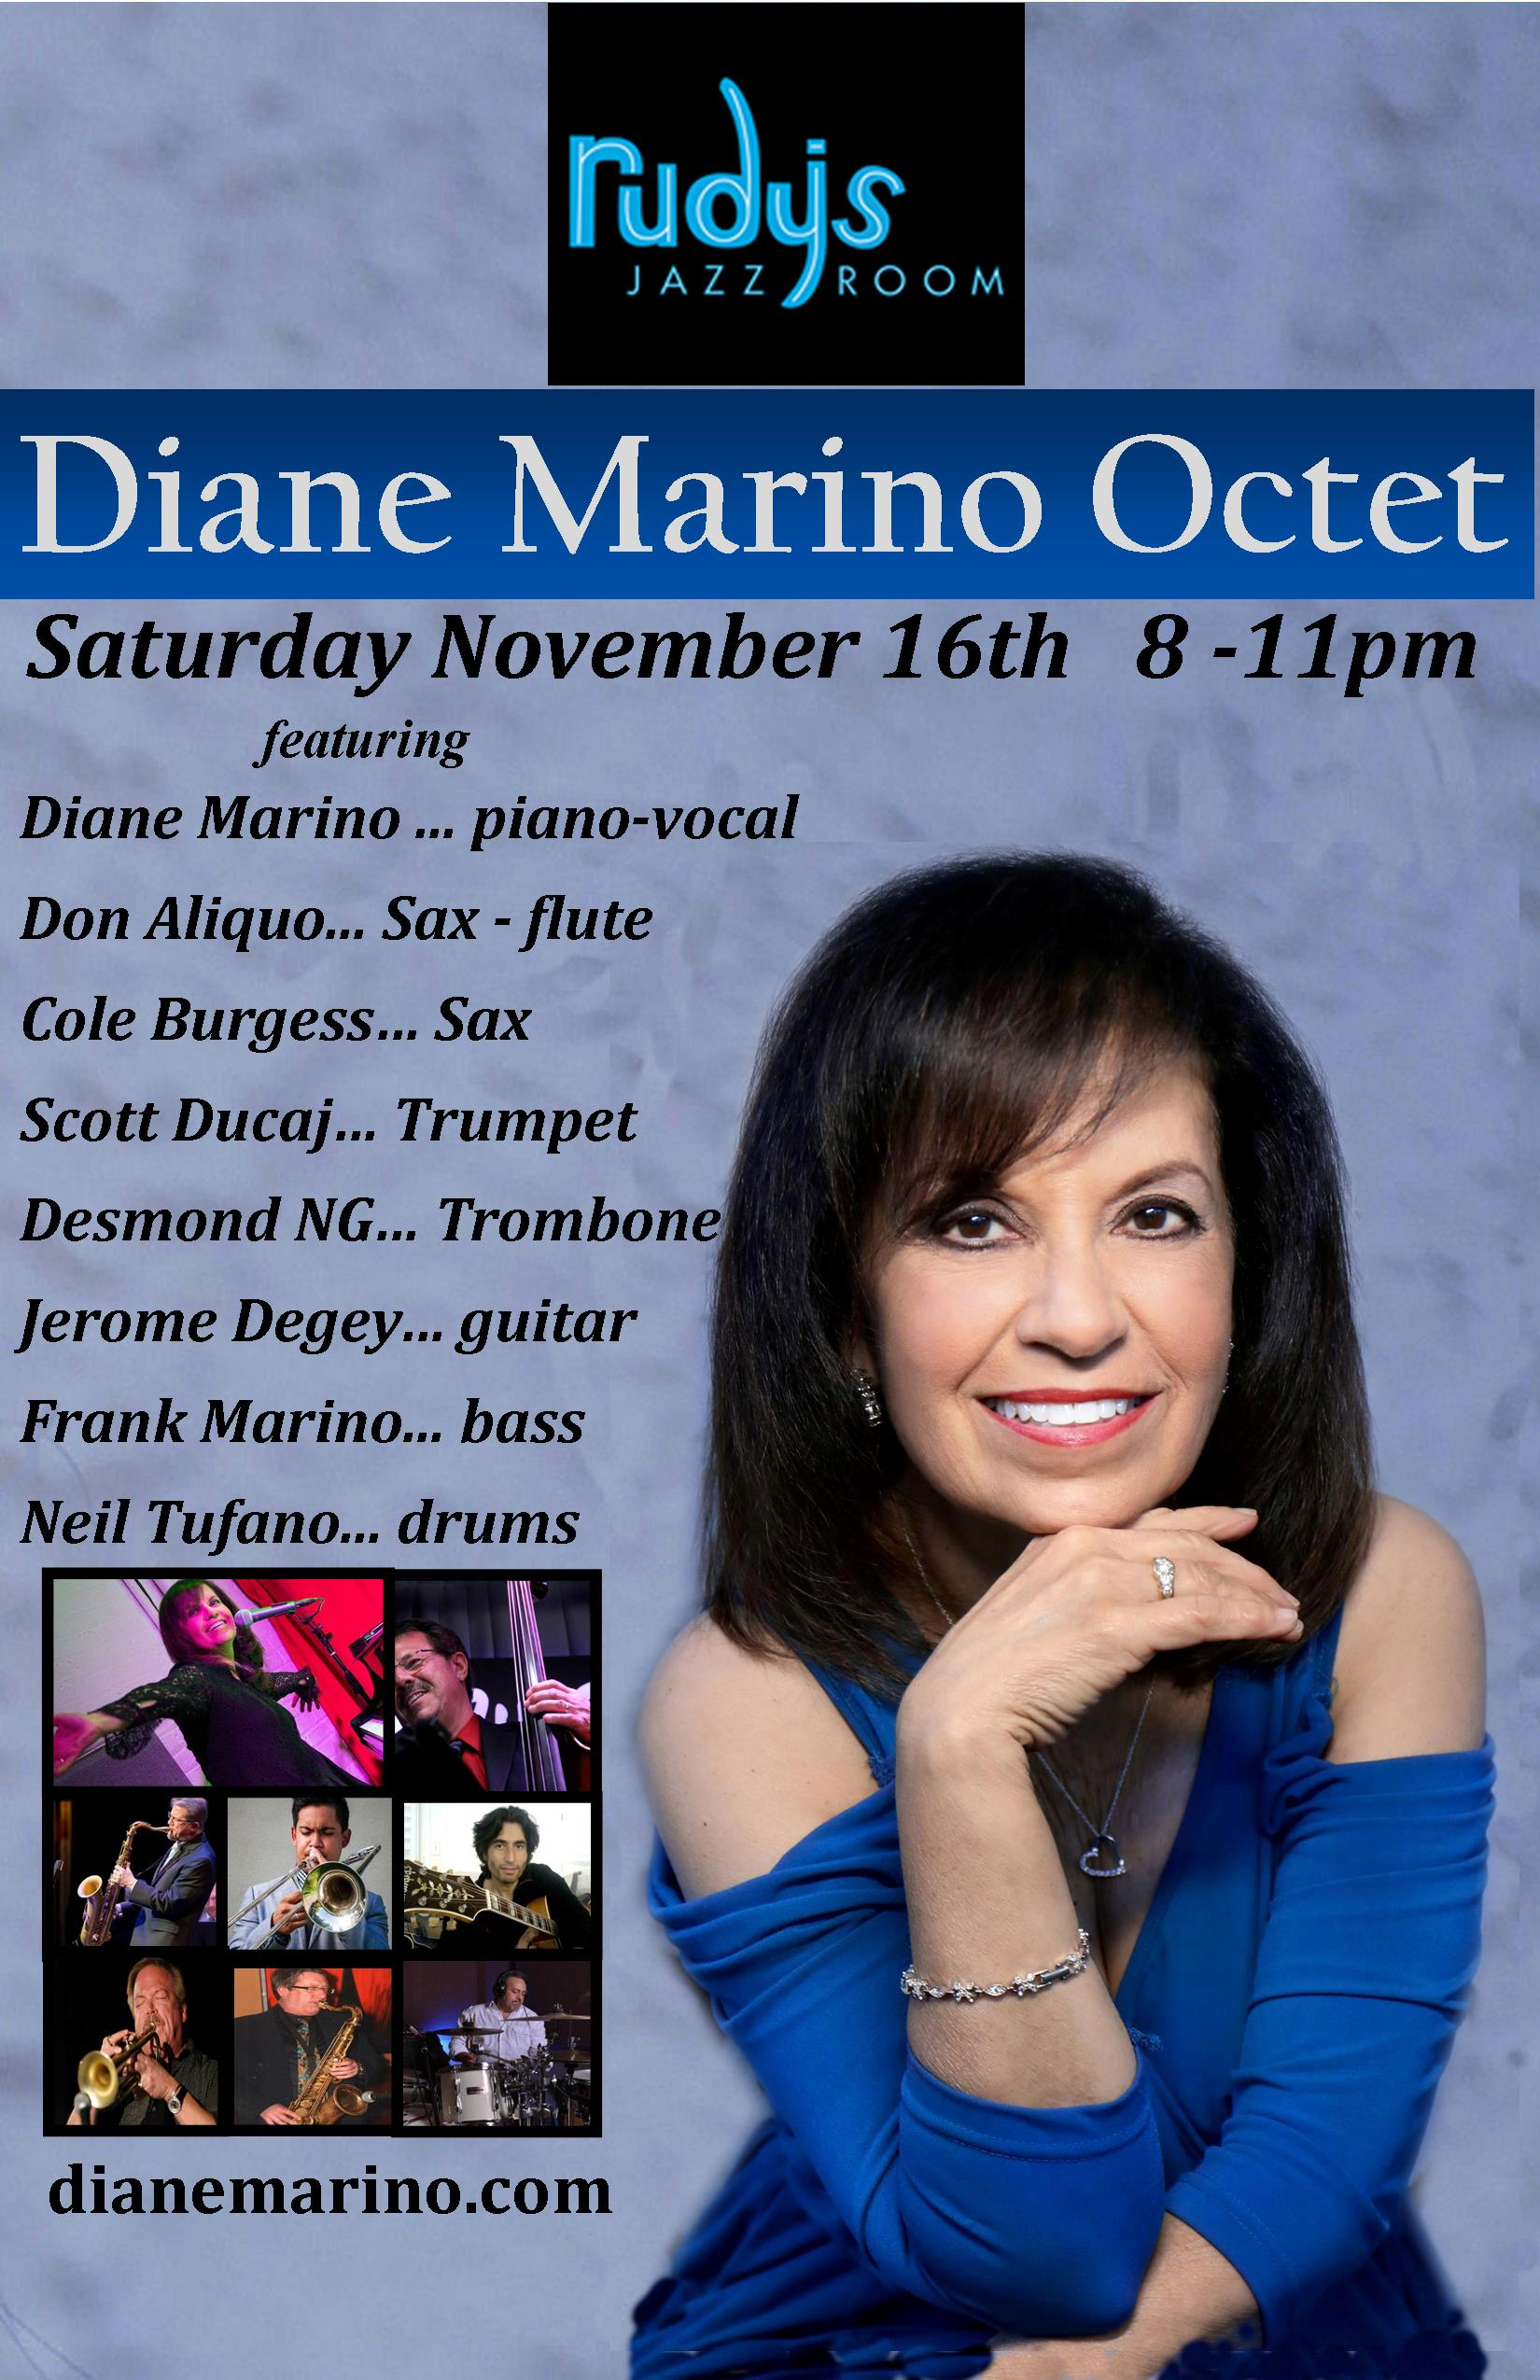 Diane Marino Octet